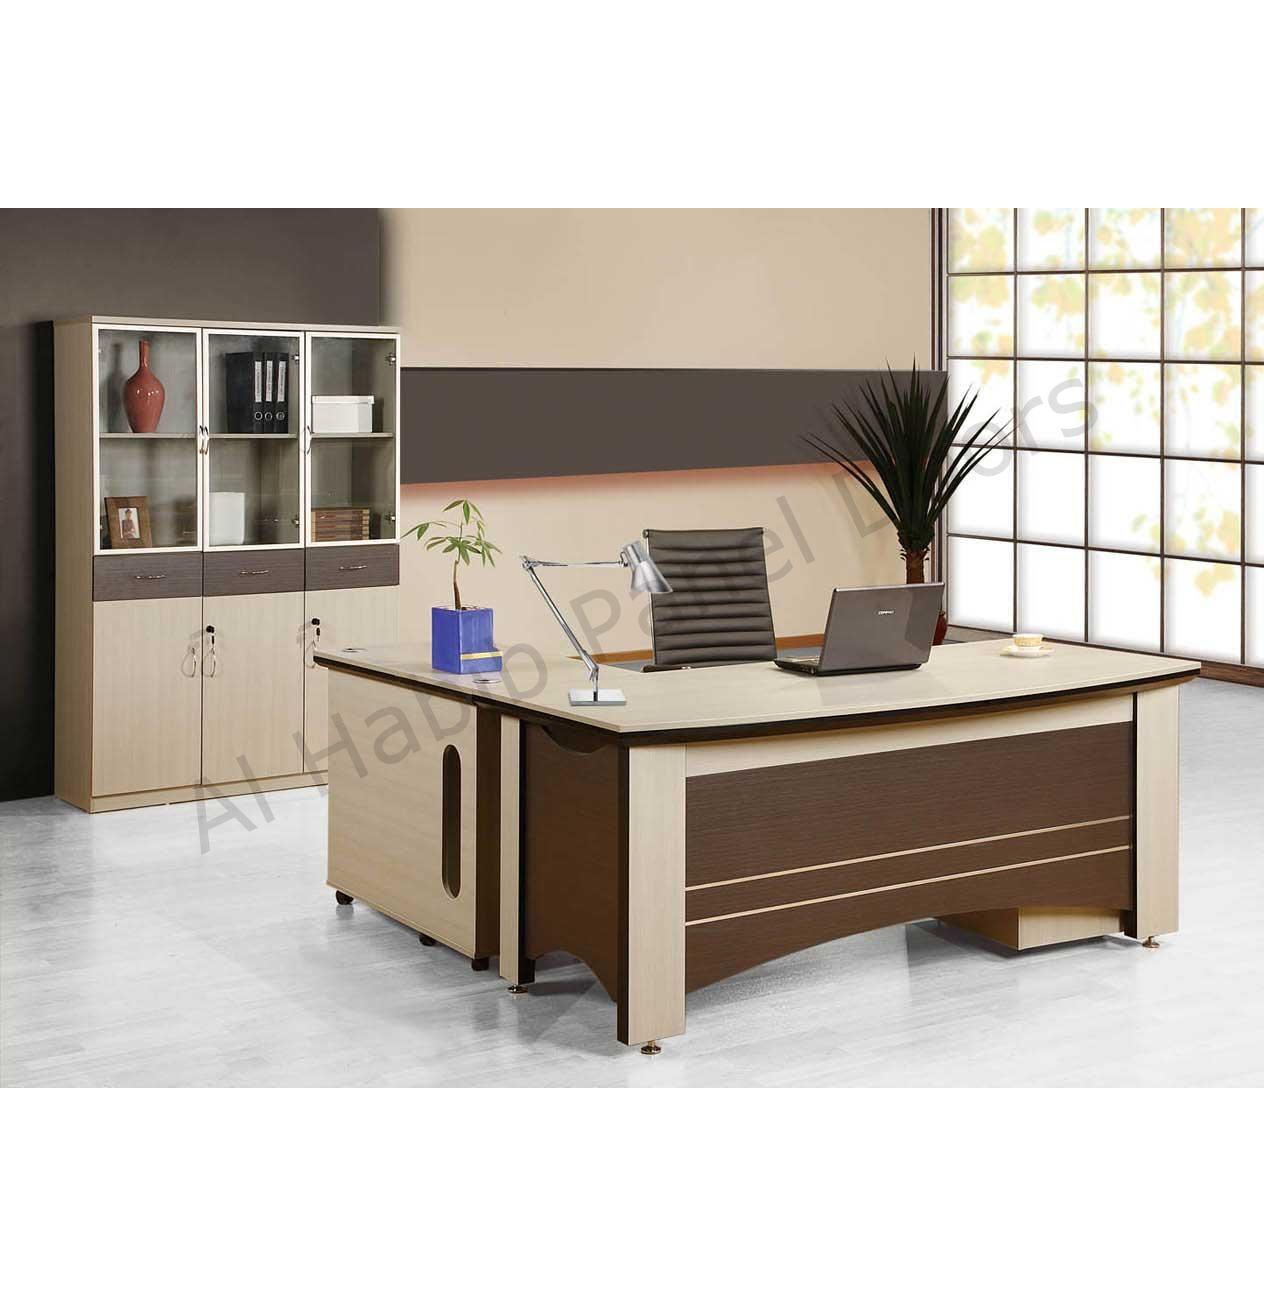 Desk For Office Environment Hpd399 Office Furniture Al